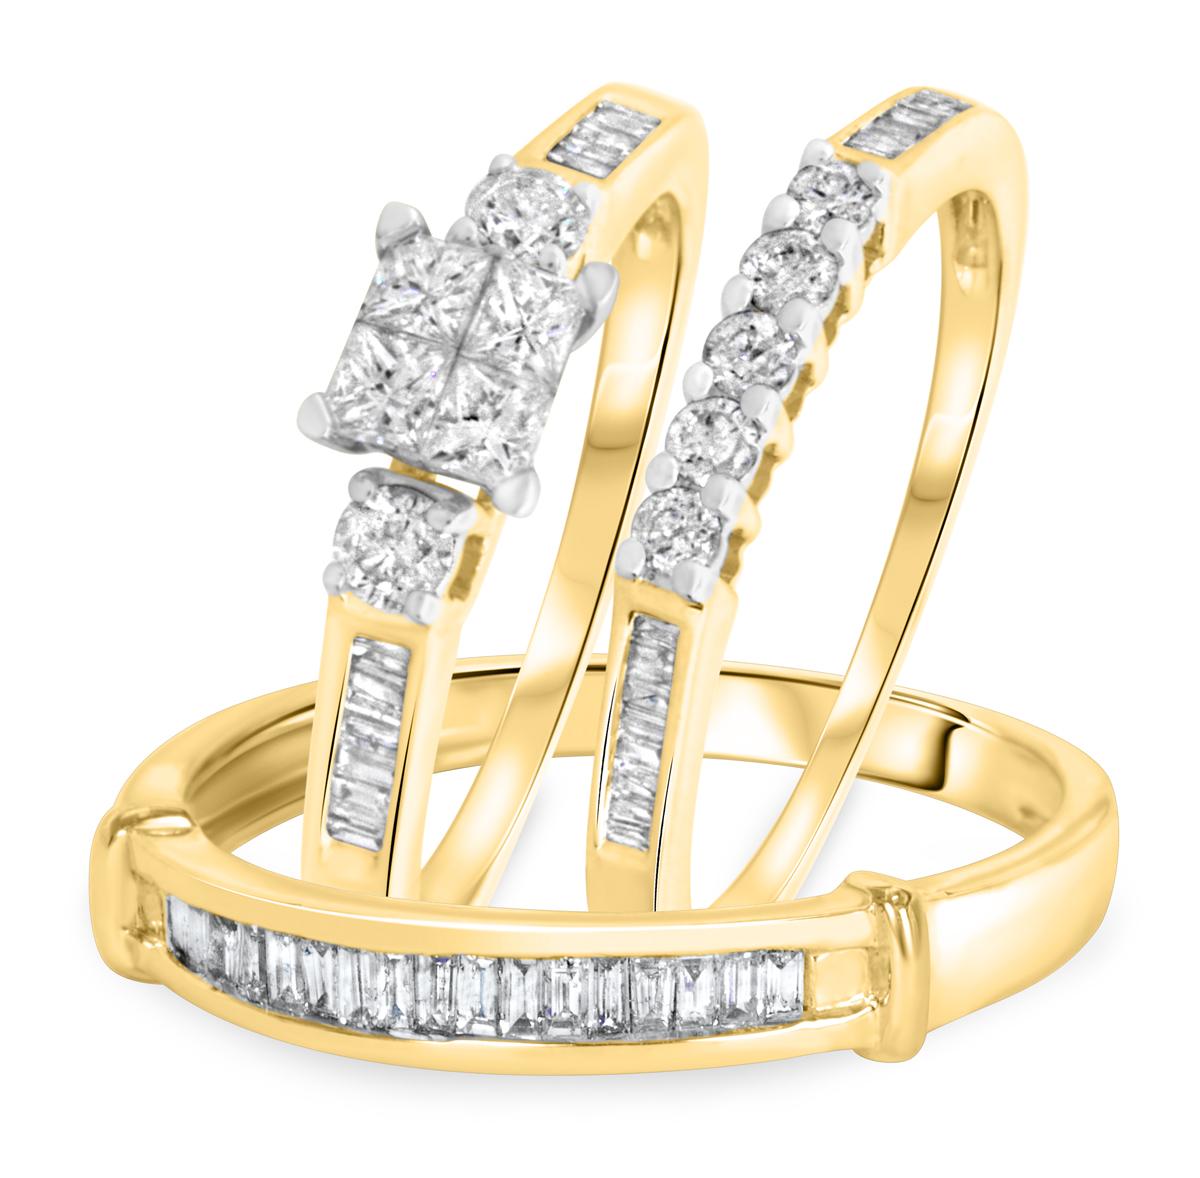 1 1/8 Carat T.W. Round Cut Diamond Women's Engagement Ring, Ladies Wedding Band,